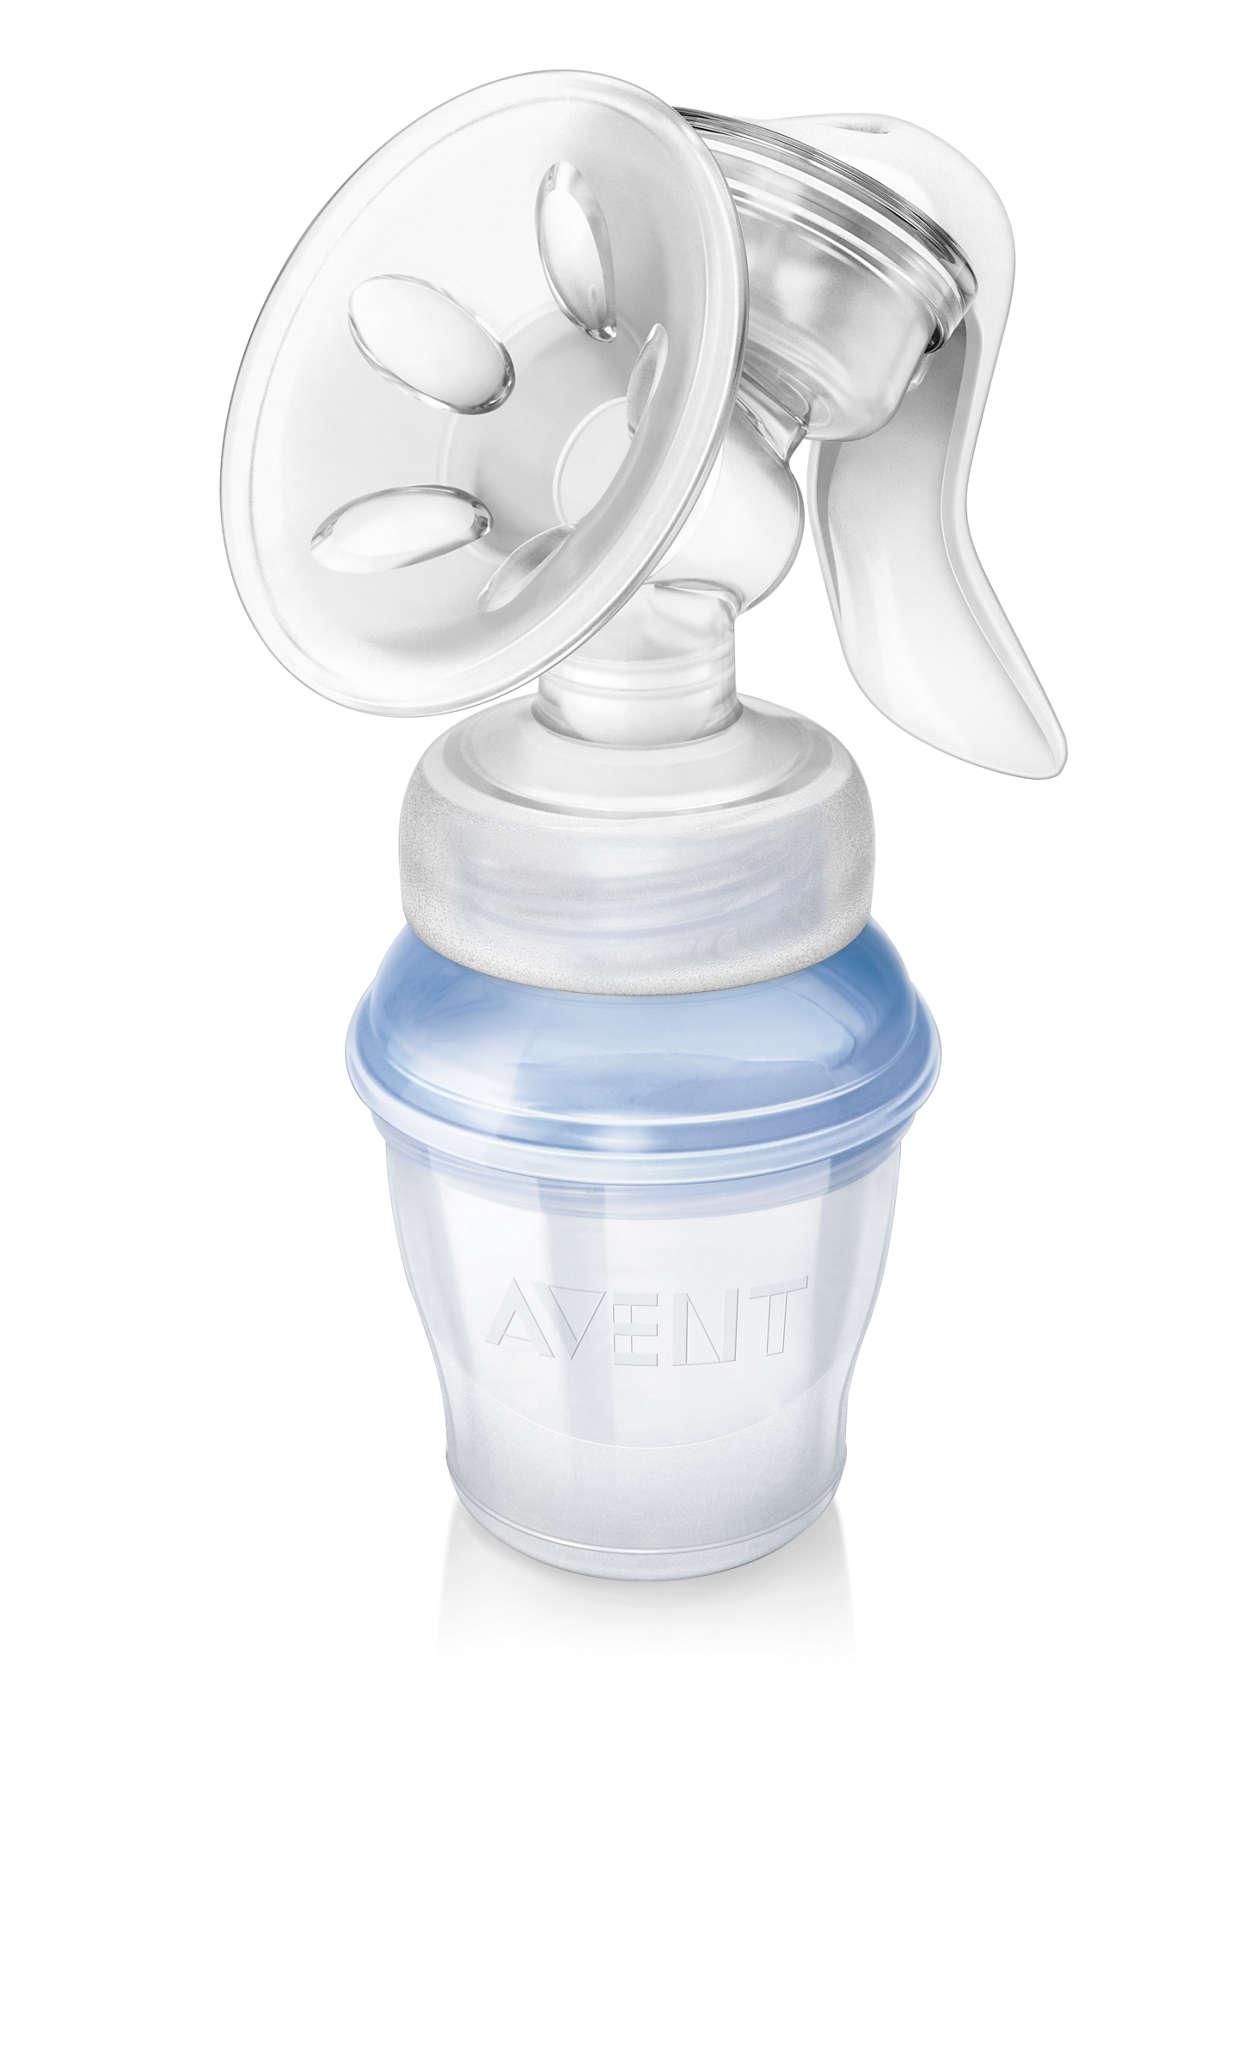 avent natural manual breast pump instructions